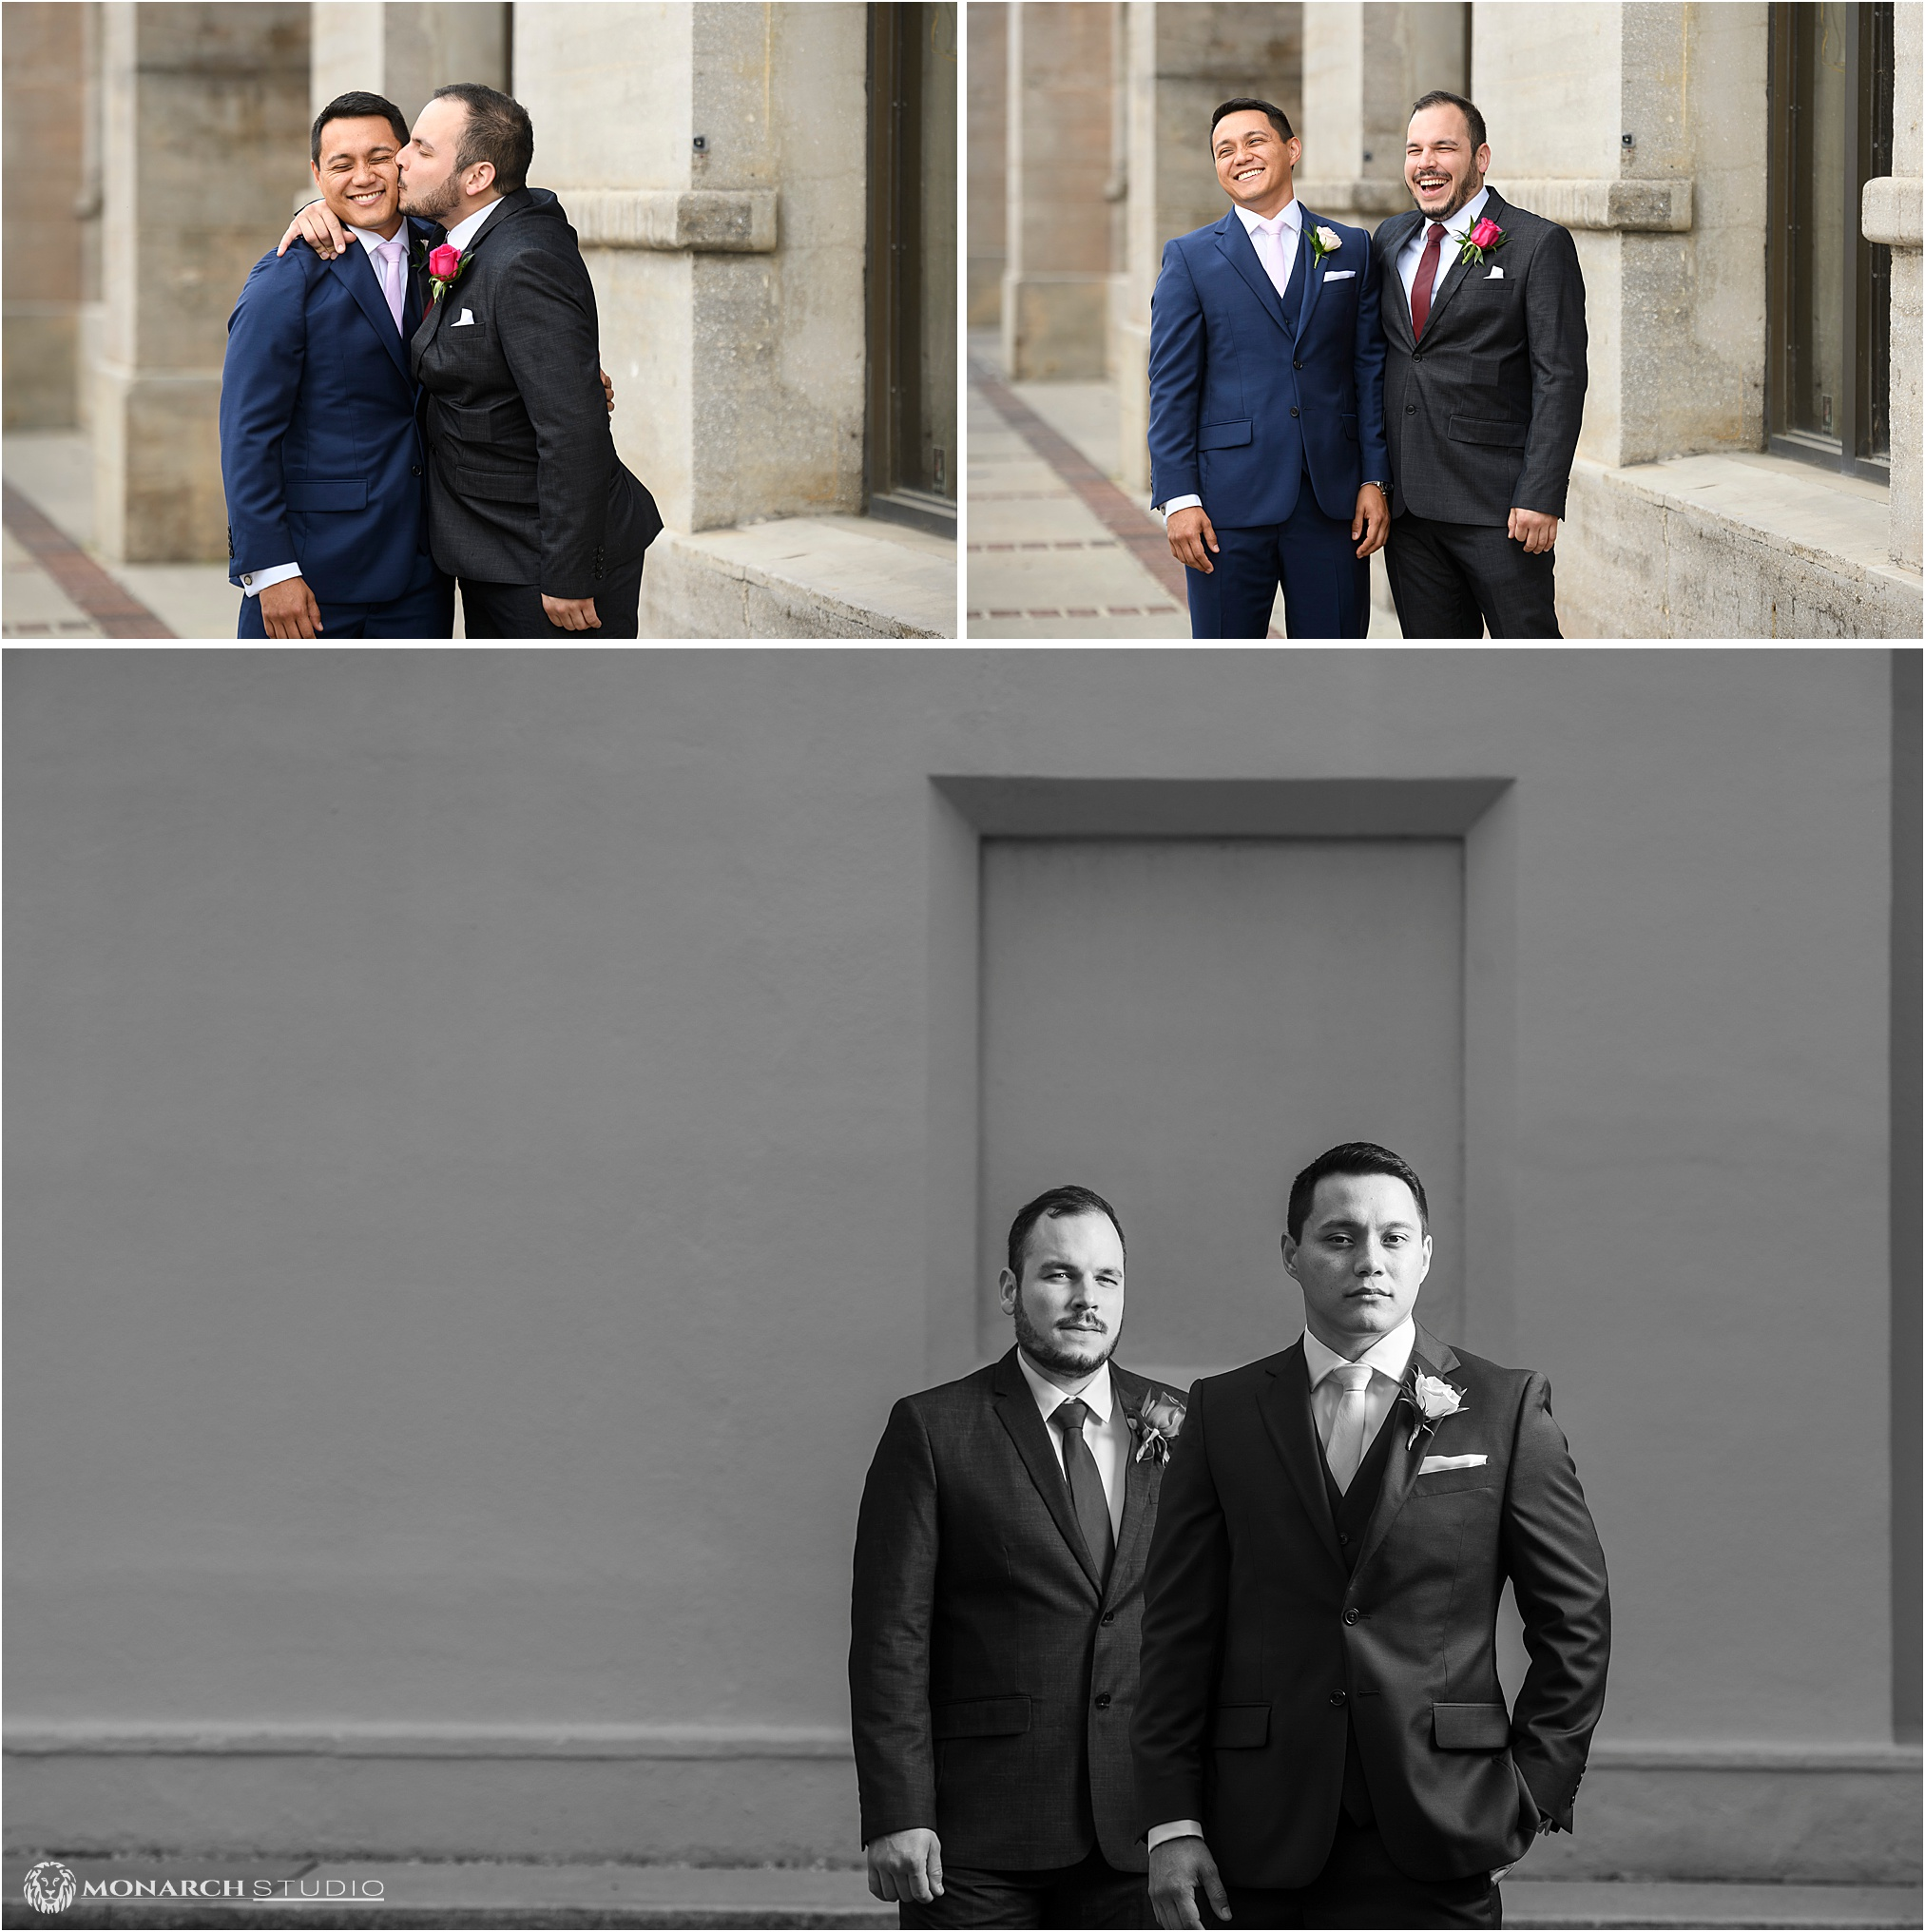 st-augustine-catholic-wedding-007.jpg